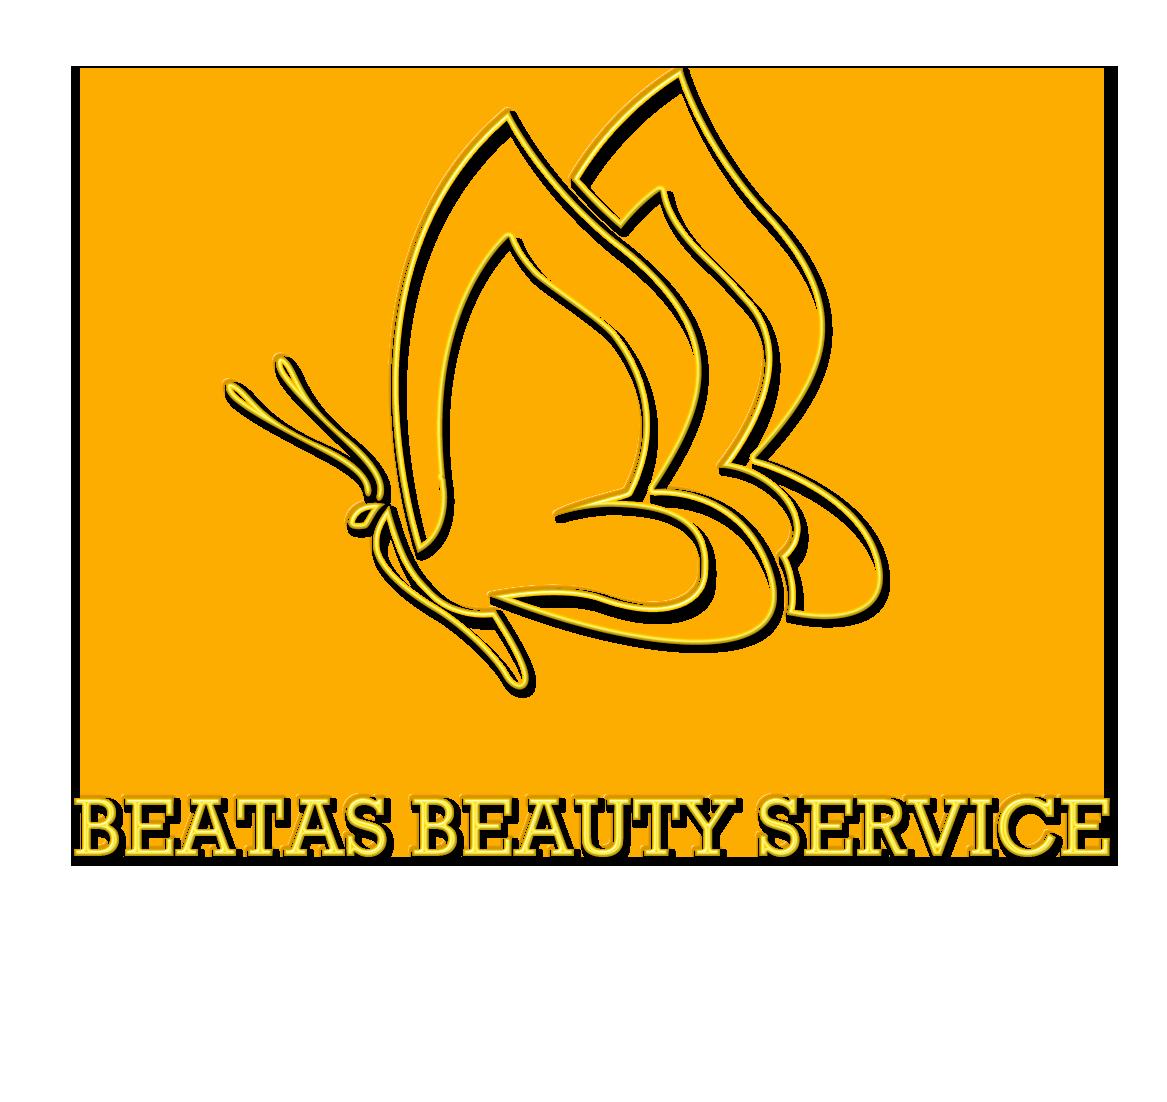 Beatas-Beauty-Service